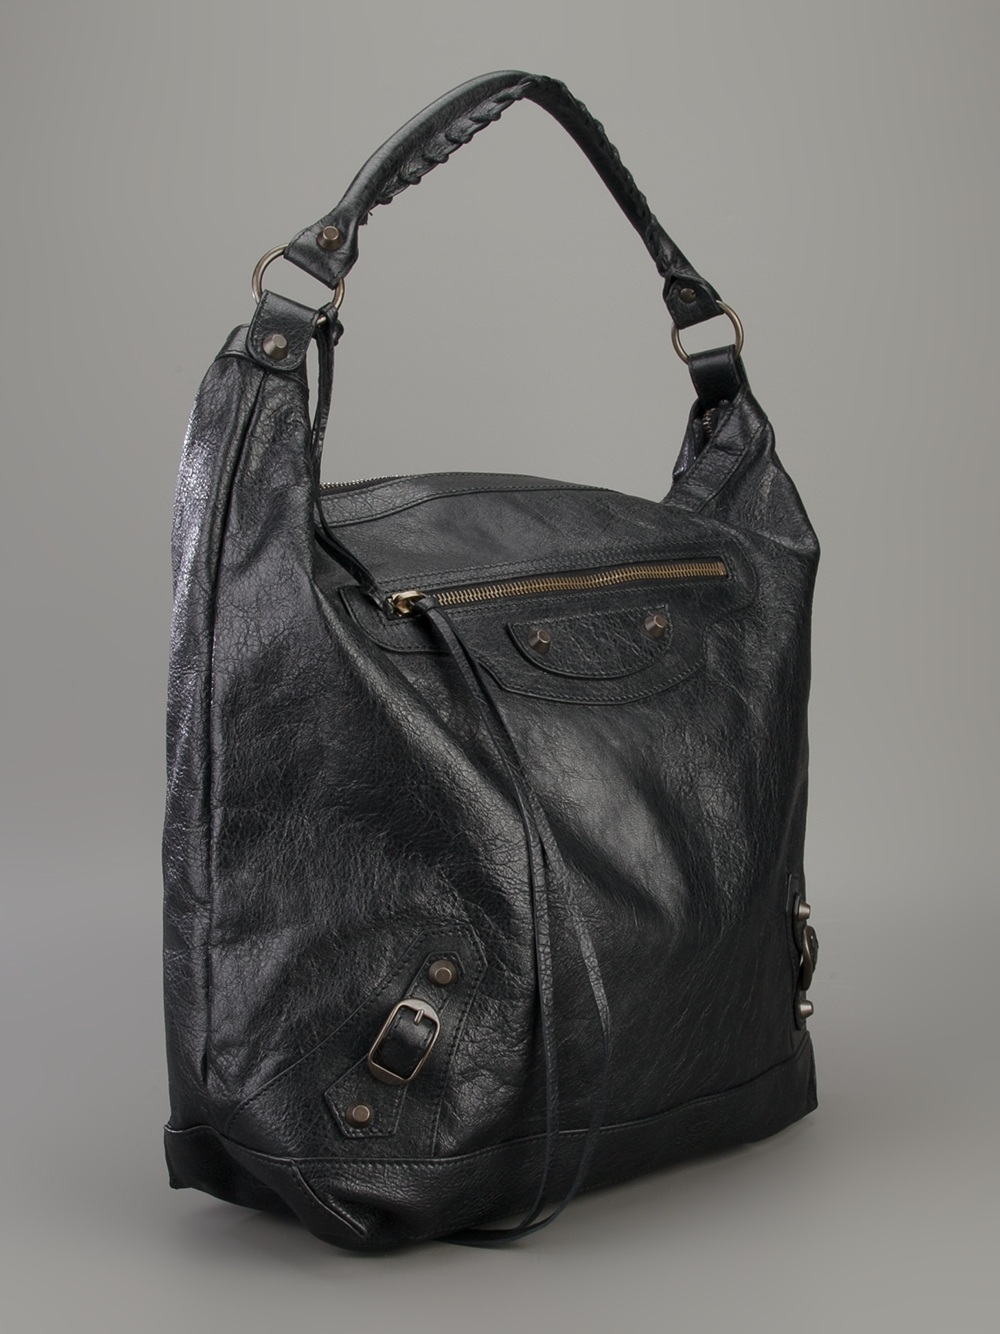 bc13a23af482 Lyst - Balenciaga Classic Day Tote Bag in Black